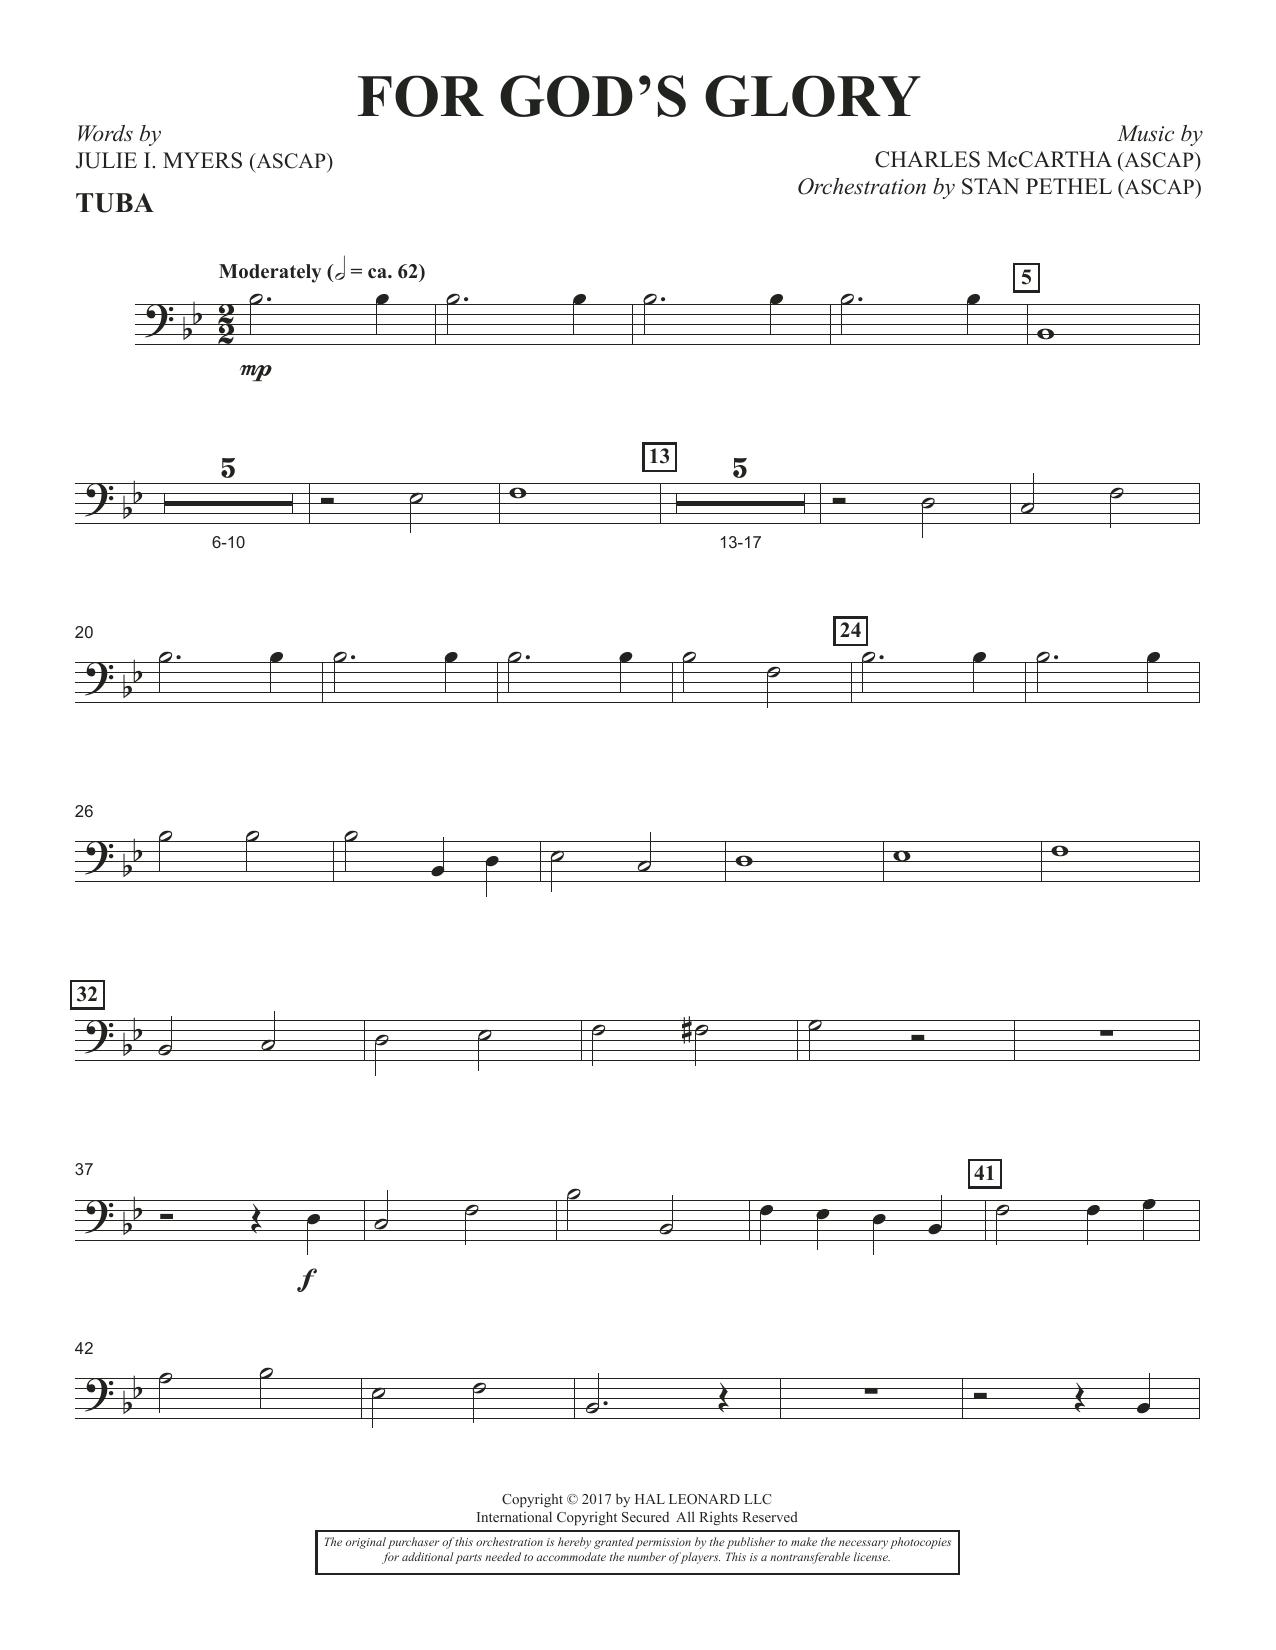 Charles McCartha For God's Glory - Tuba sheet music notes and chords. Download Printable PDF.